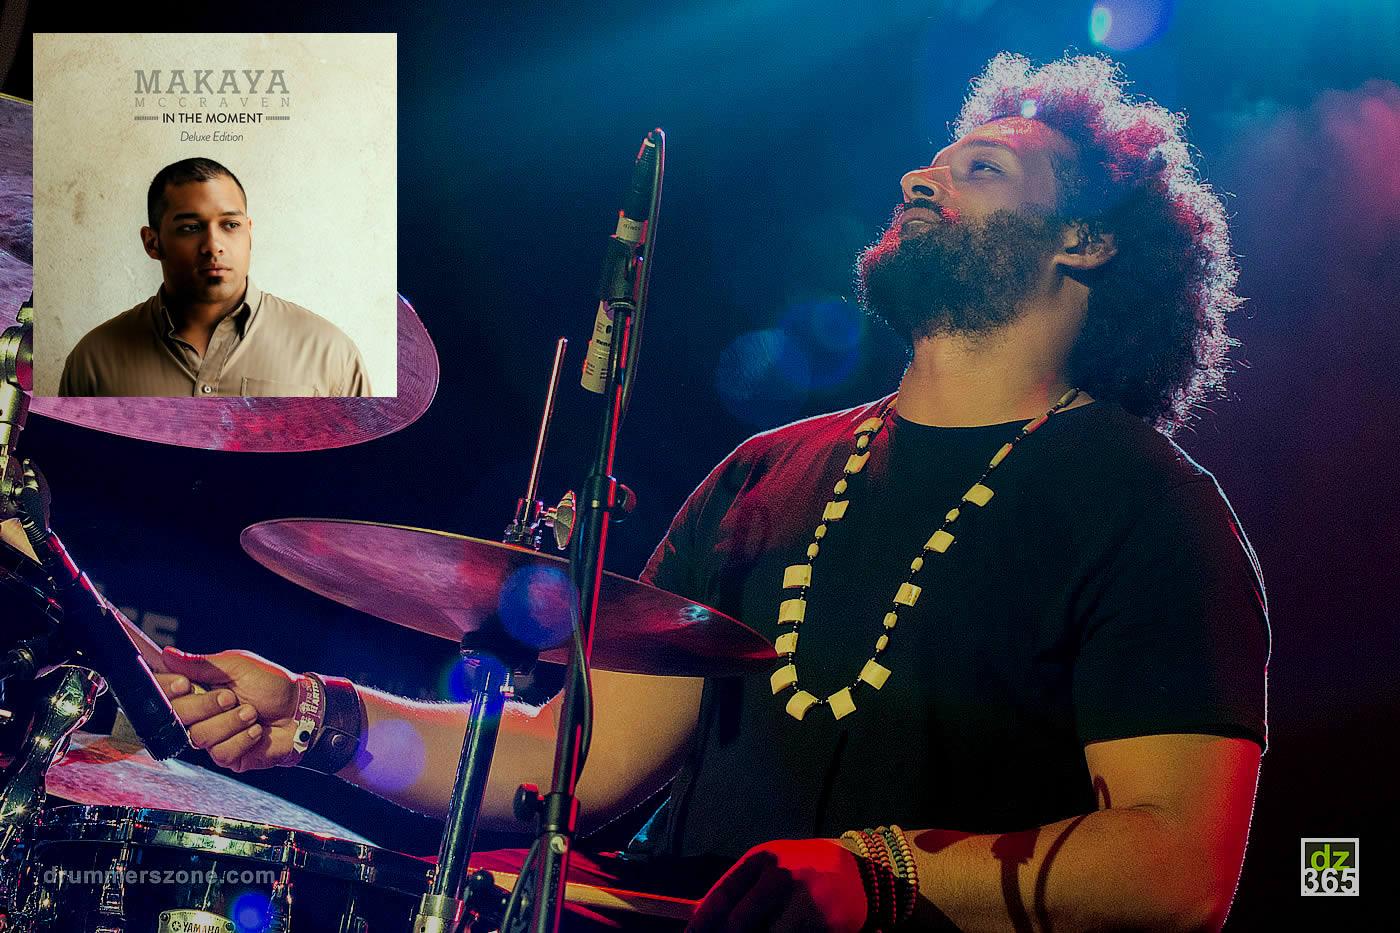 Makaya McCraven\'s different Drummer-Hats - An interview with Chicago\'s Jazz Hip hop & Dance World Drummer